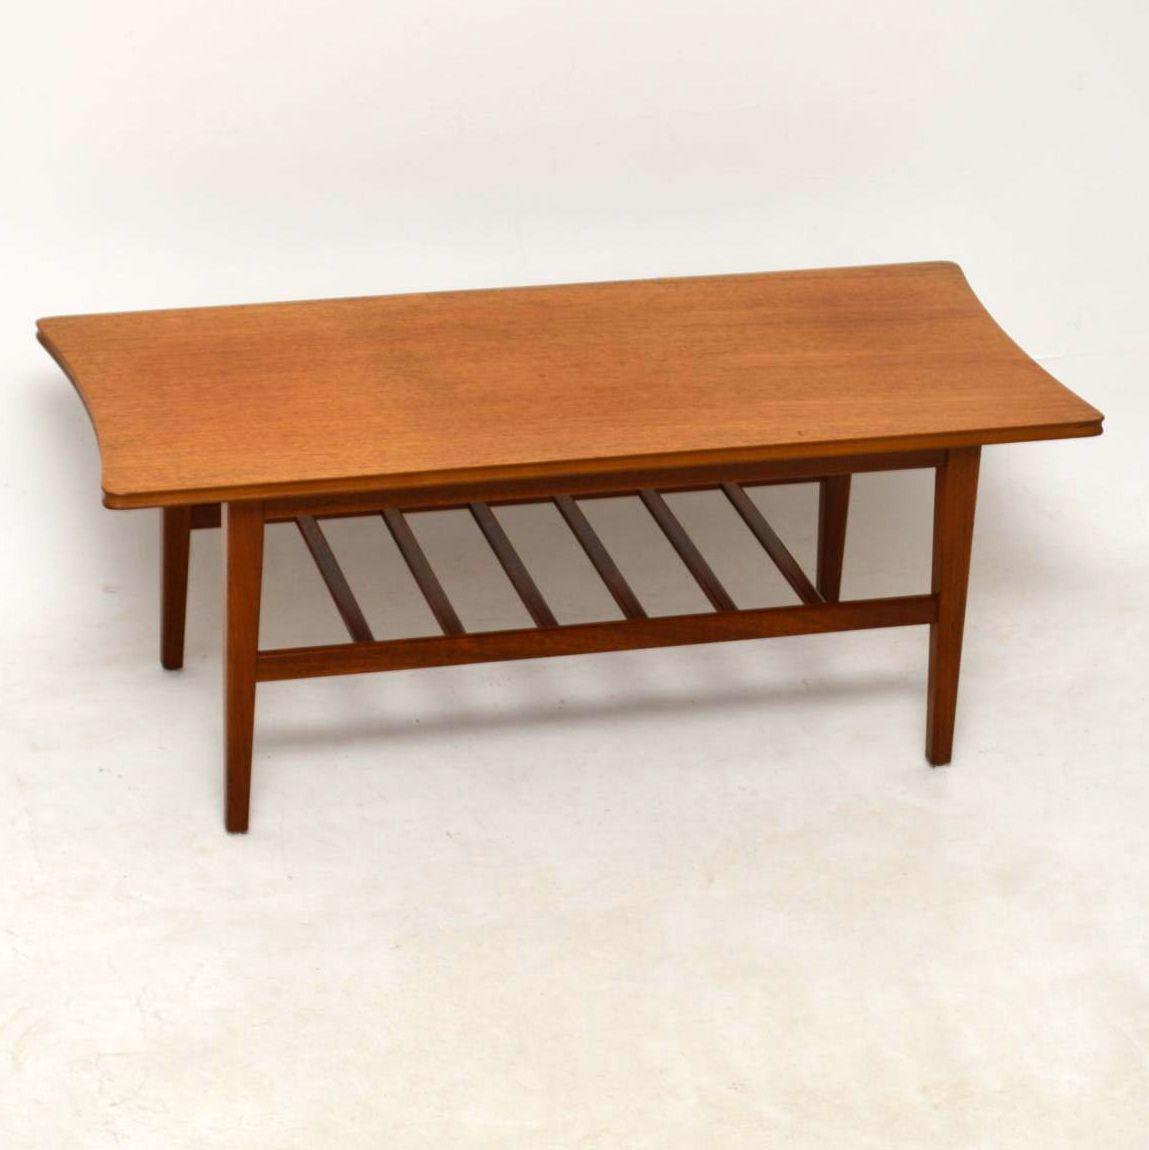 teak coffee table. RETRO TEAK COFFEE TABLE BY RICHARD HORNBY VINTAGE 1950\u0027s Teak Coffee Table